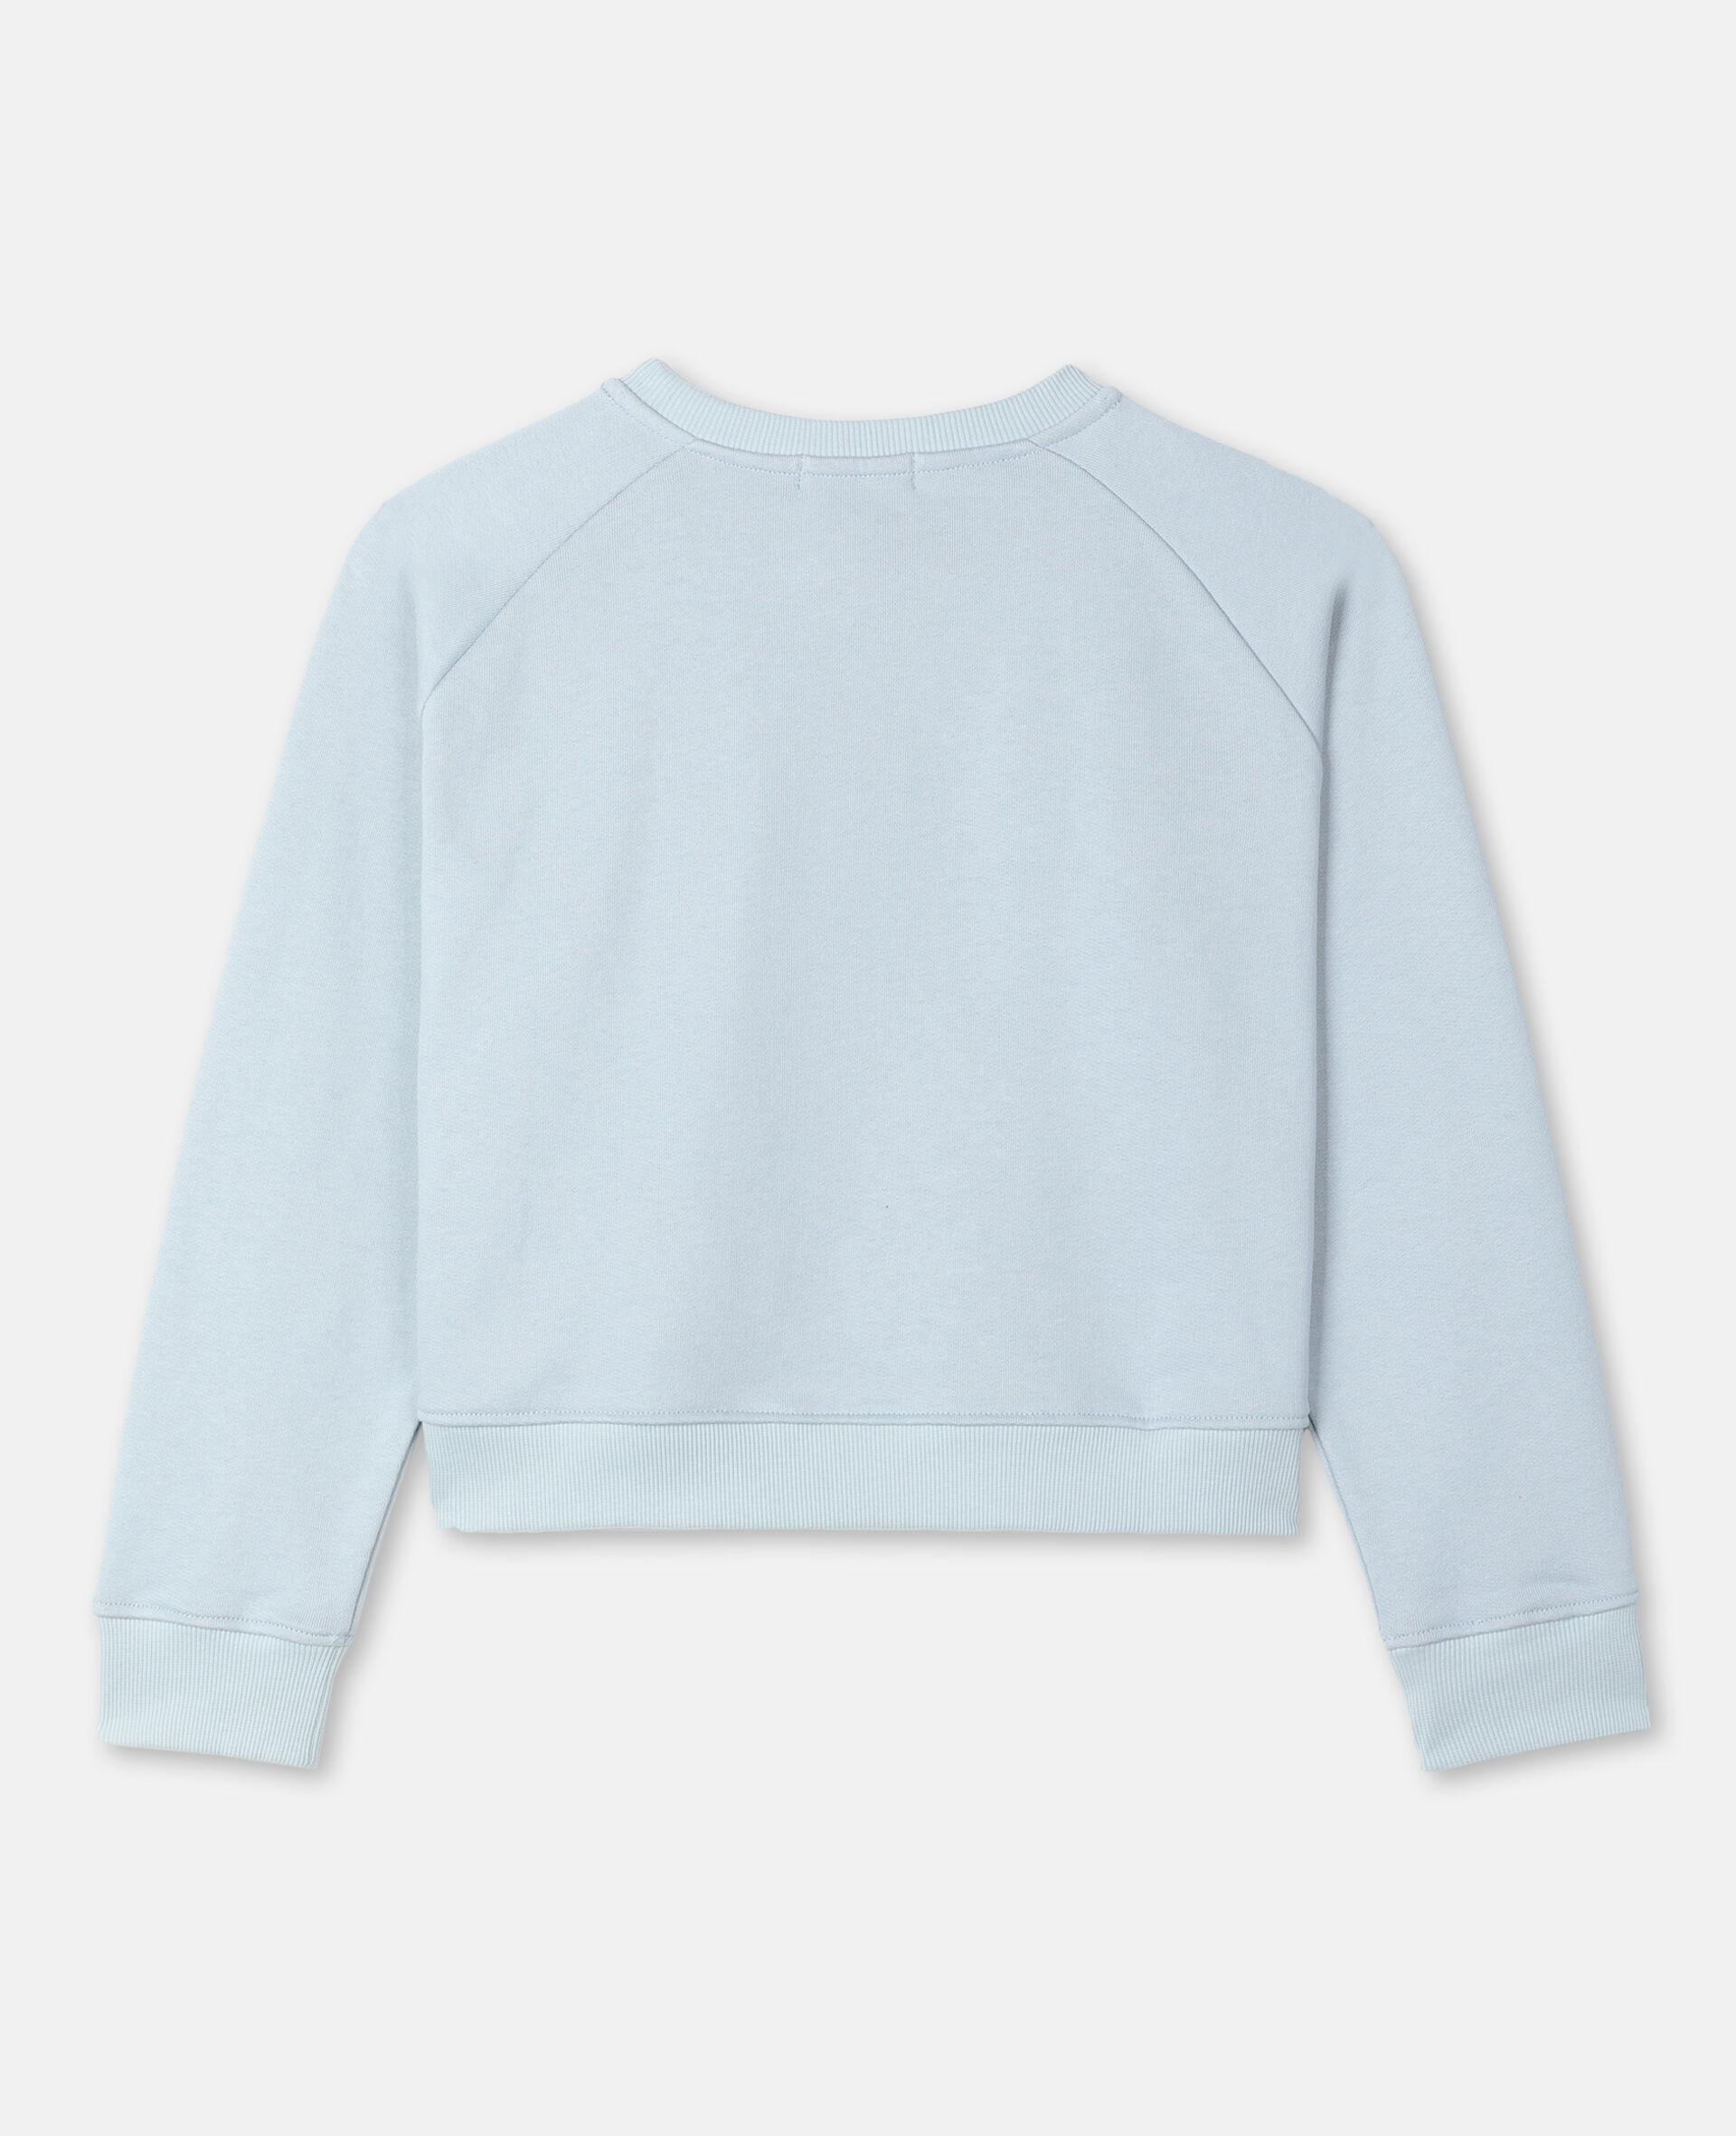 Baumwollfleece-Sweatshirt mit malerischem Flamingo-Print -Blau-large image number 3